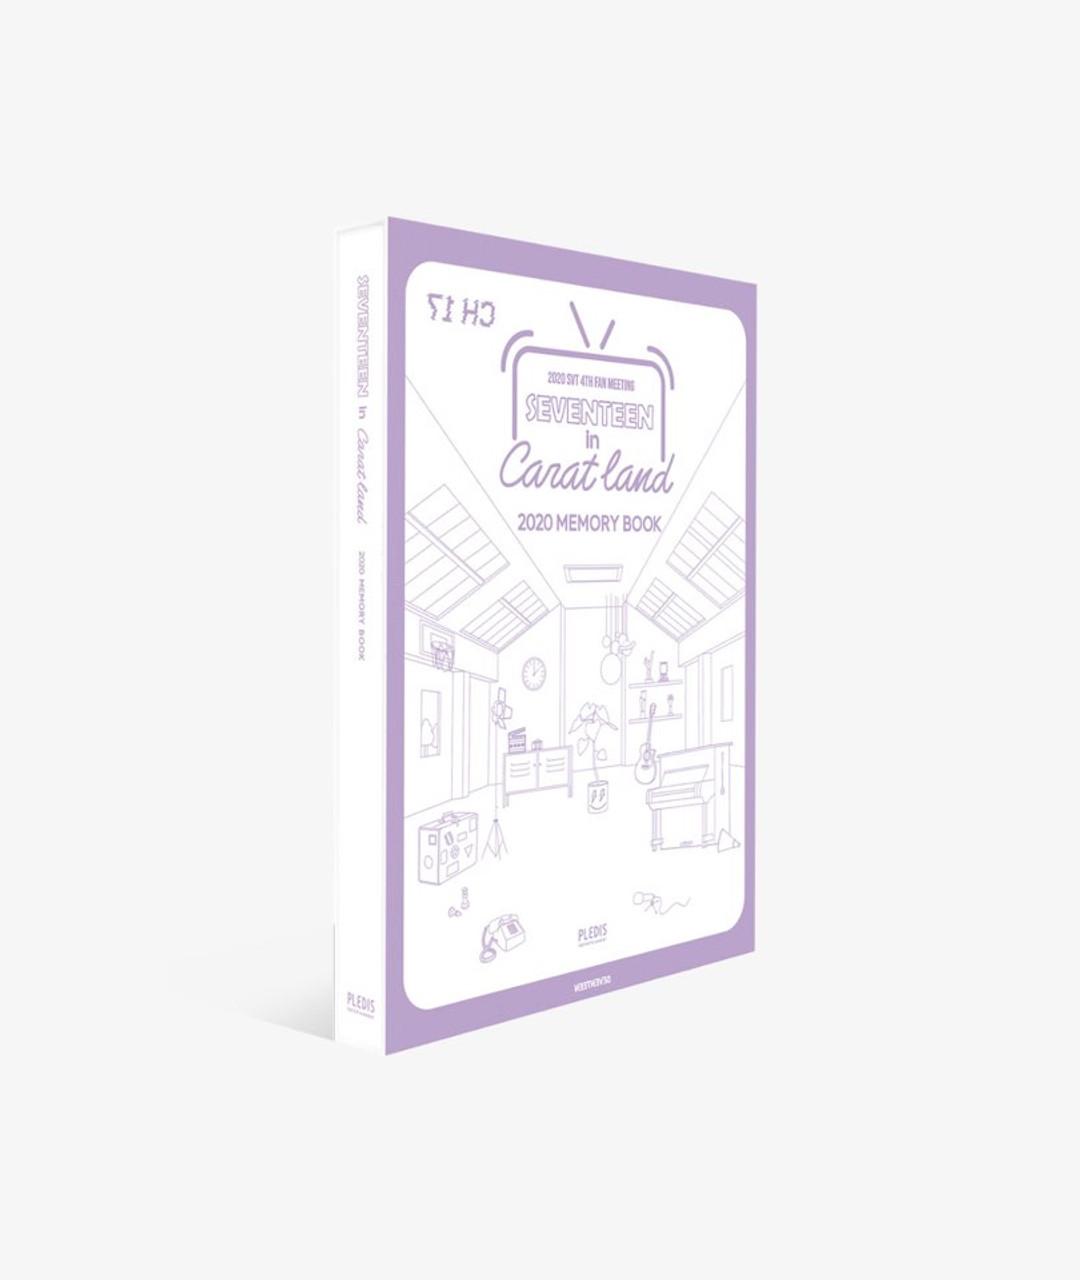 SEVENTEEN - 2020 Memory Book